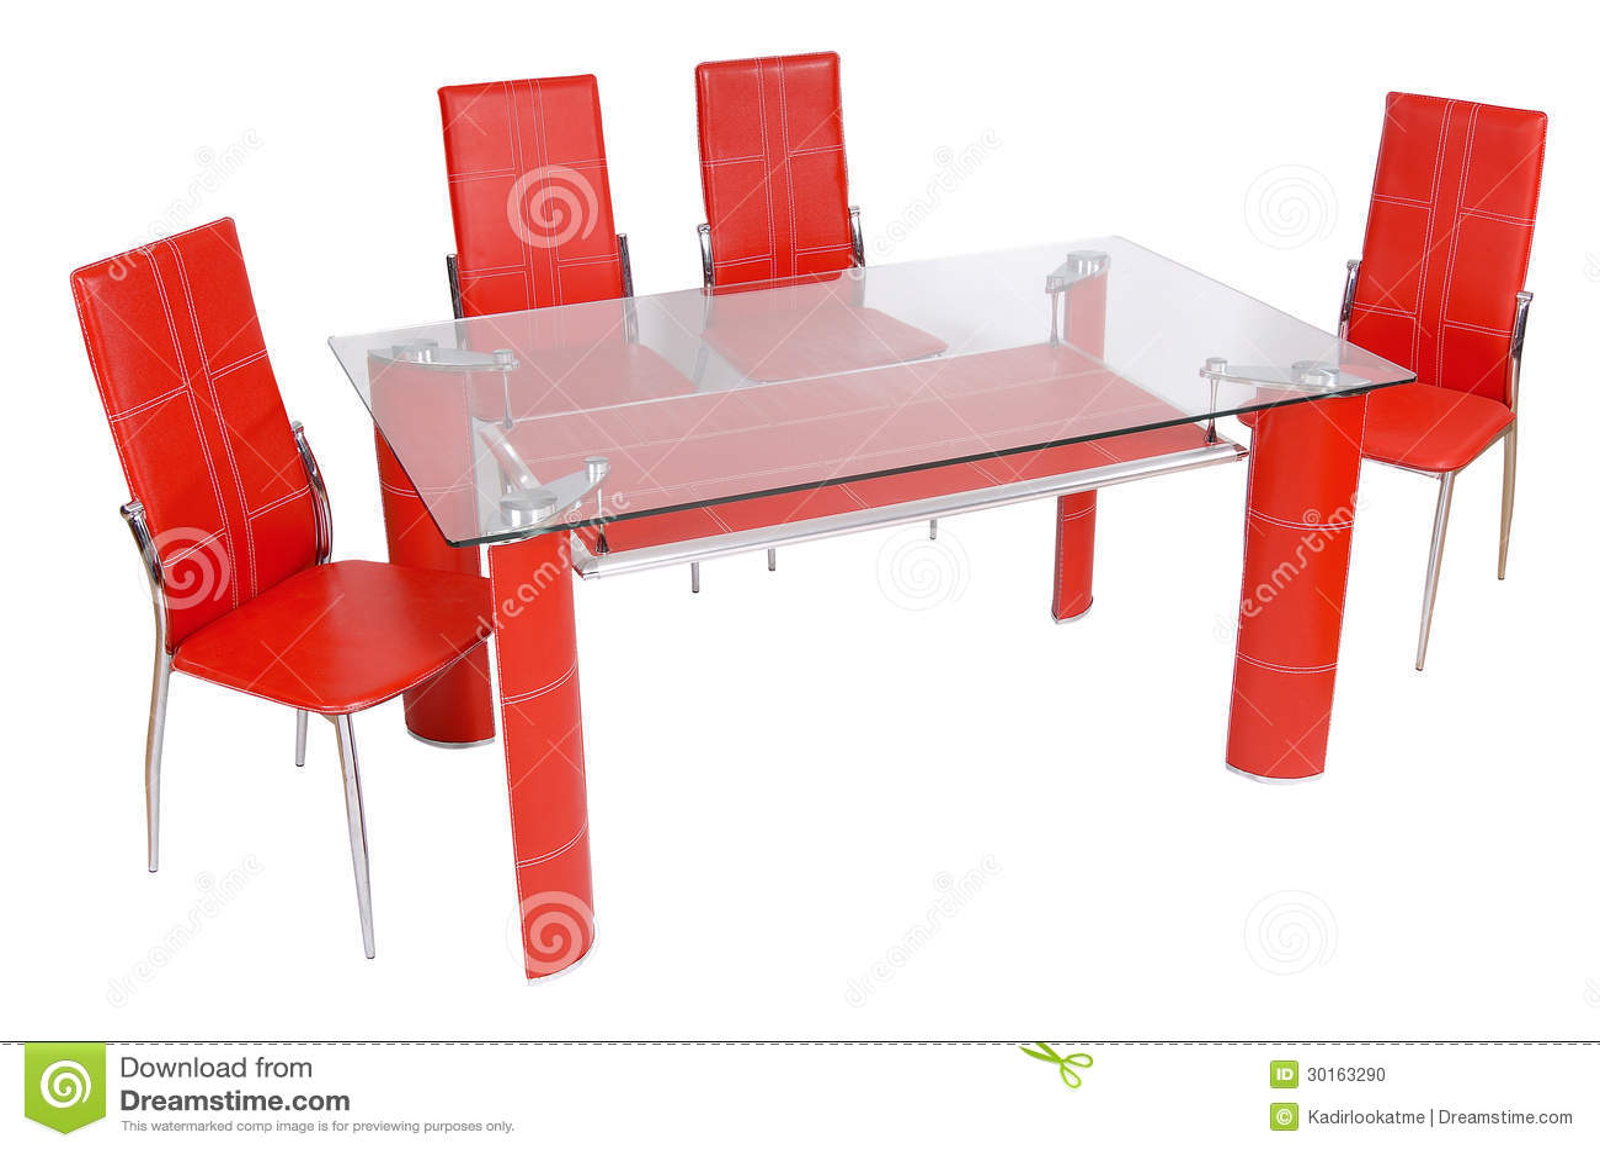 Ikea sedie e sgabelli open zoom with ikea sedie e sgabelli